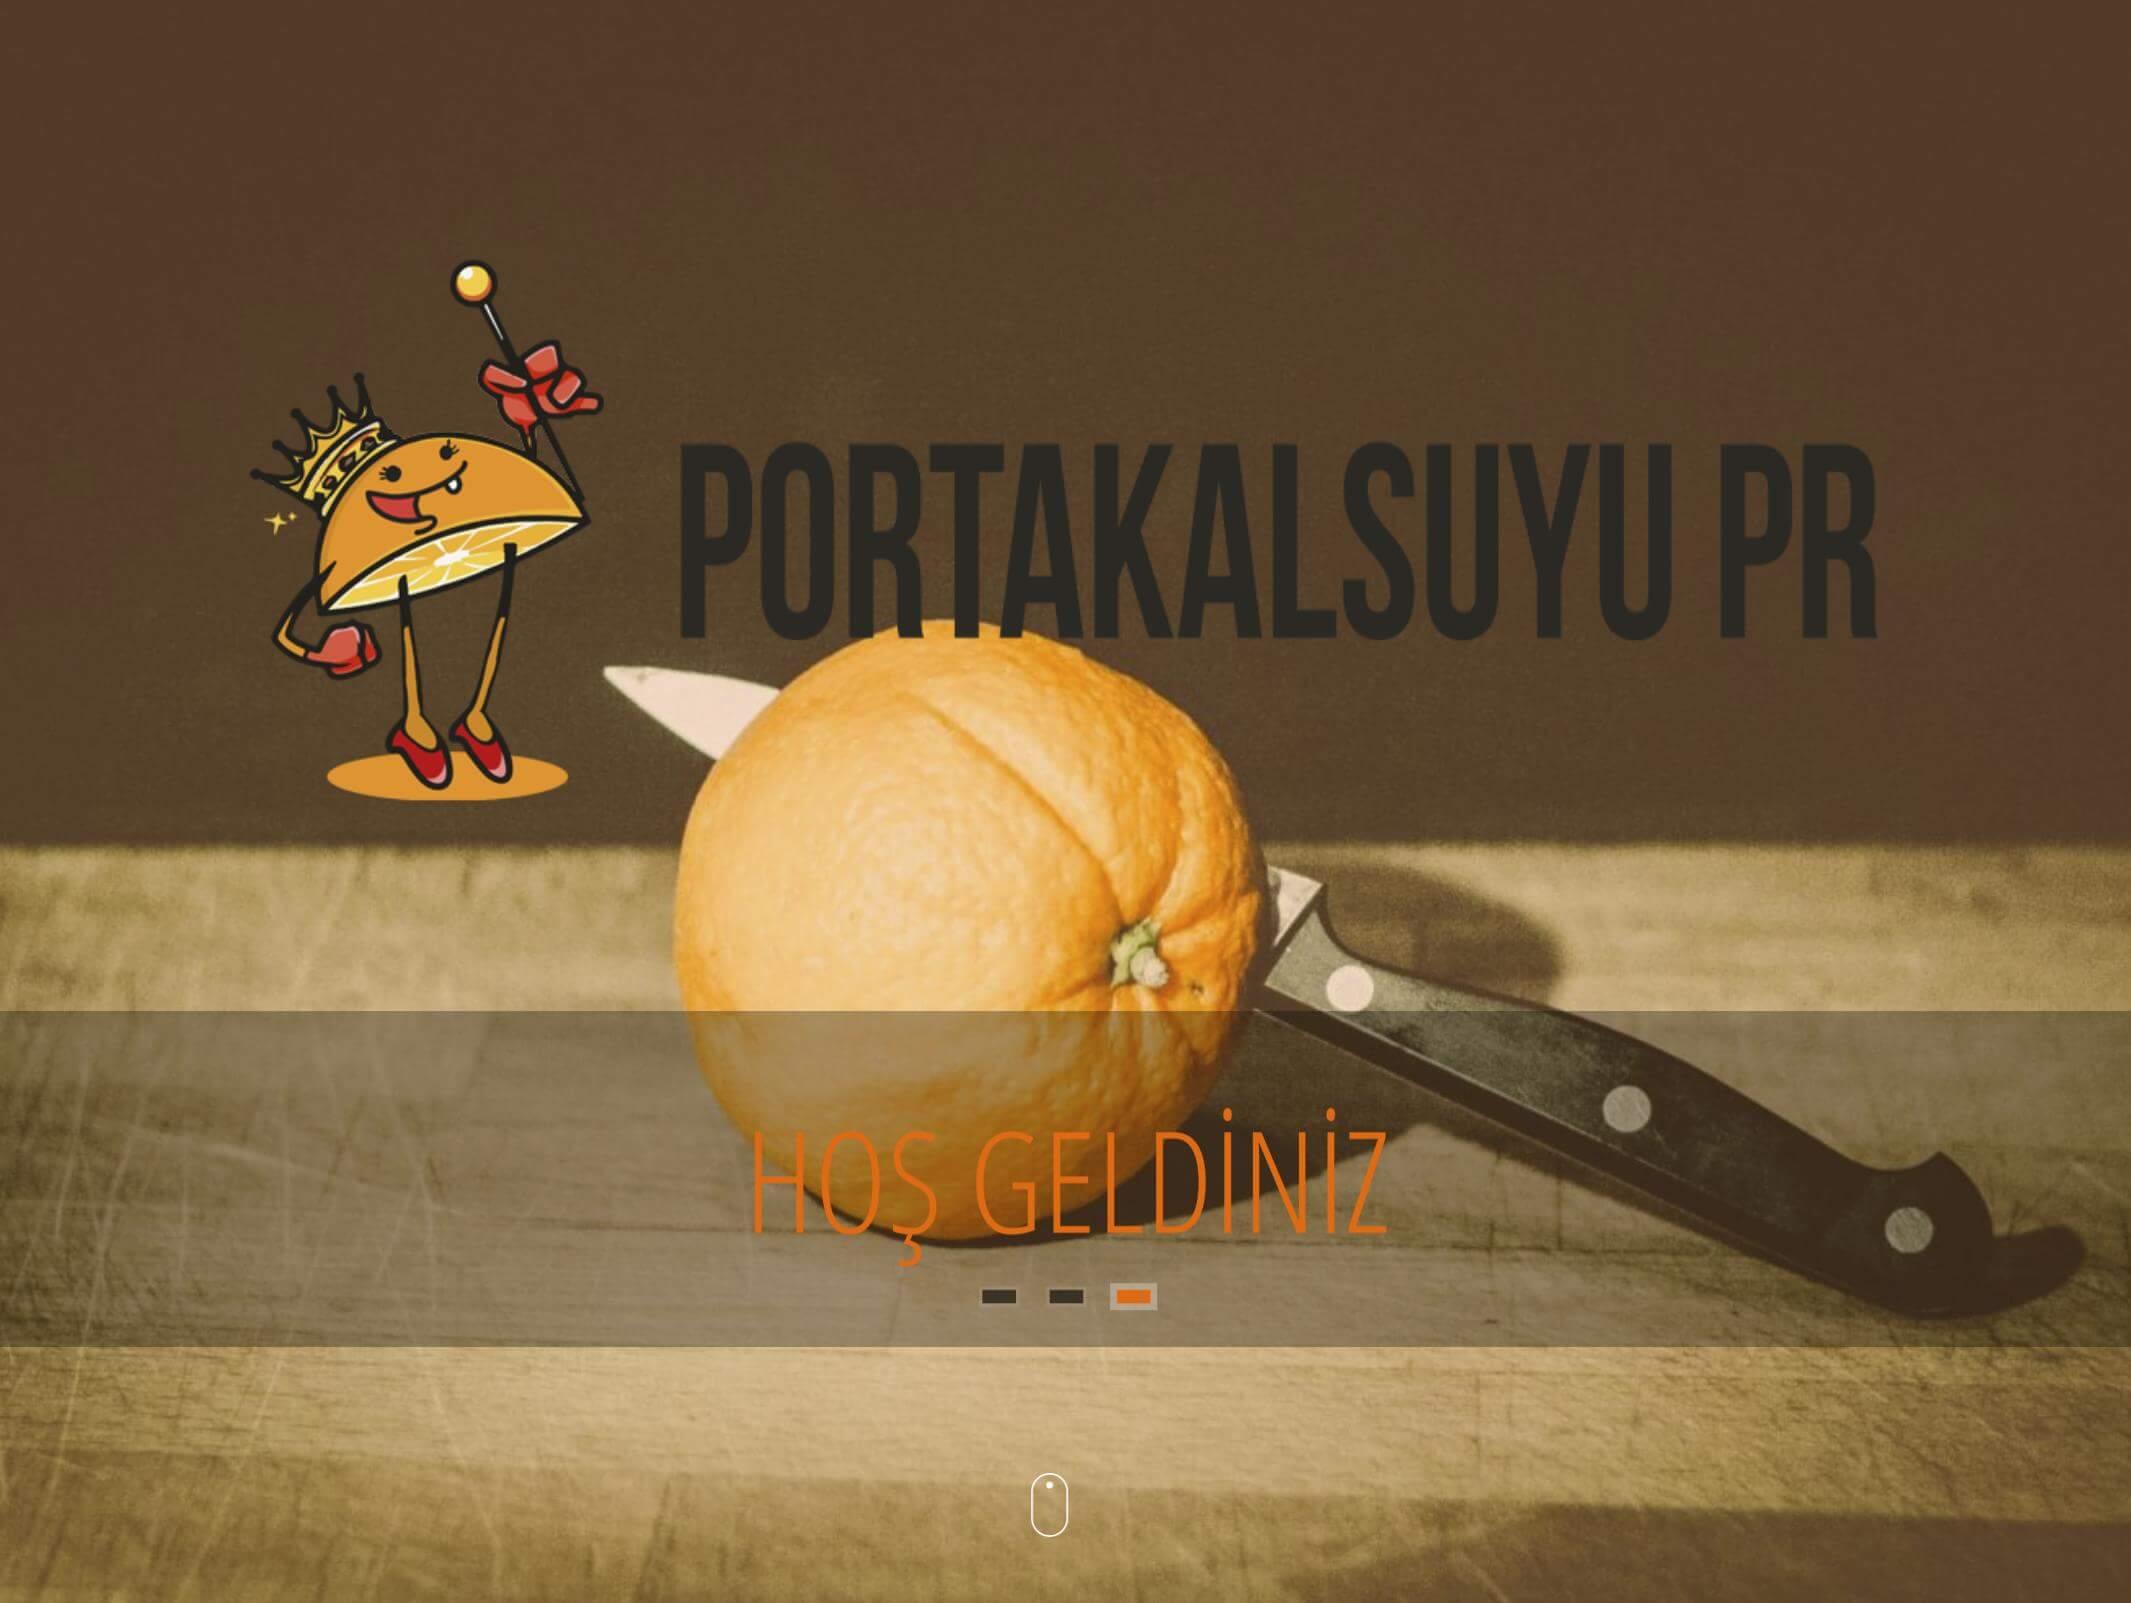 Portakalsuyu PR Ajansı Web Sitesi